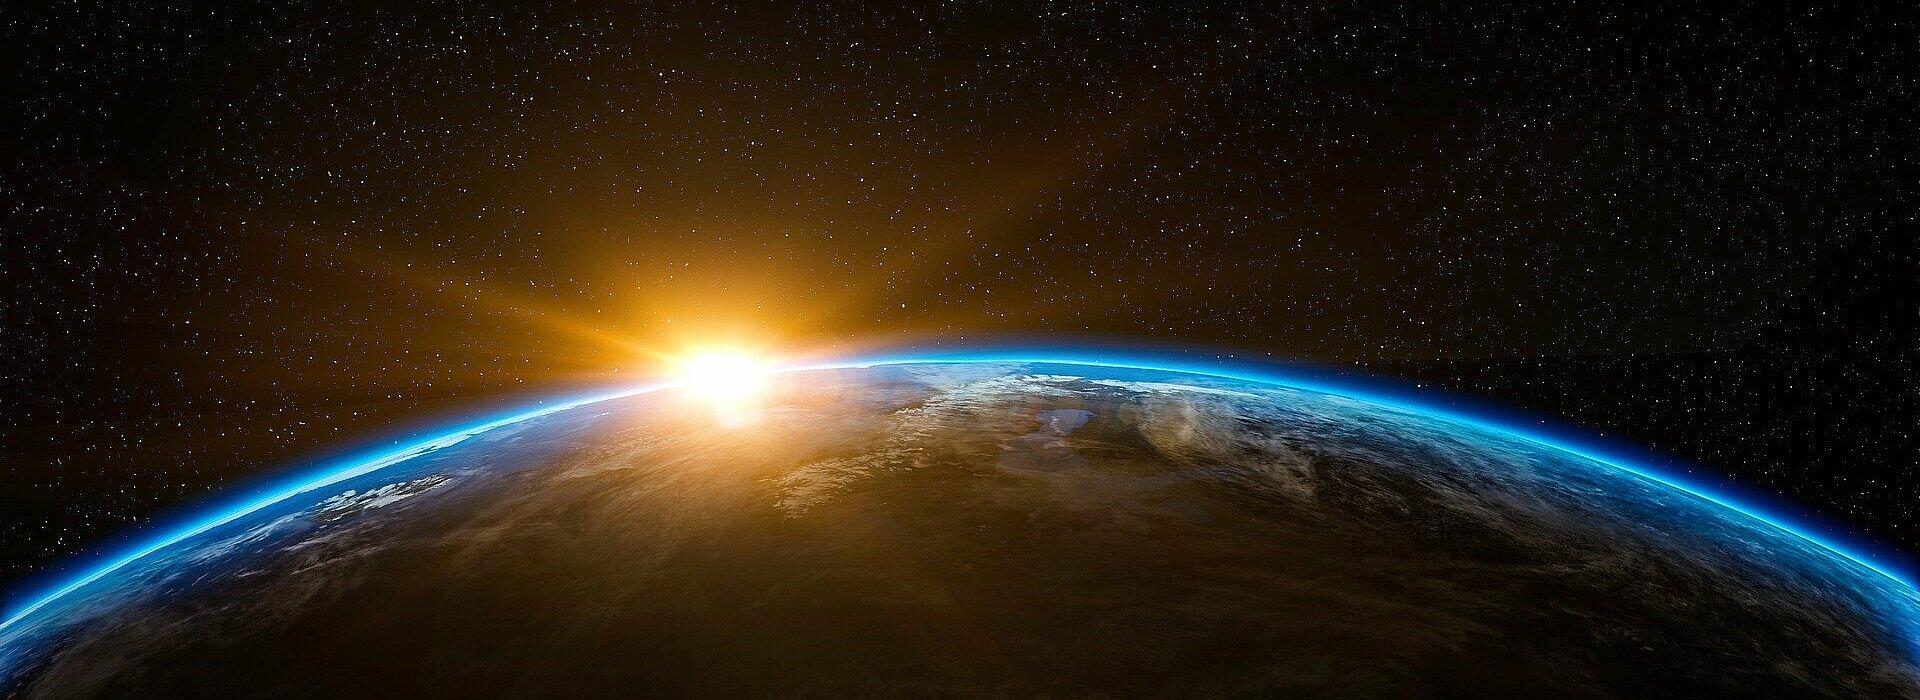 Planeta Terra visto de longe, com Sol ao fundo.